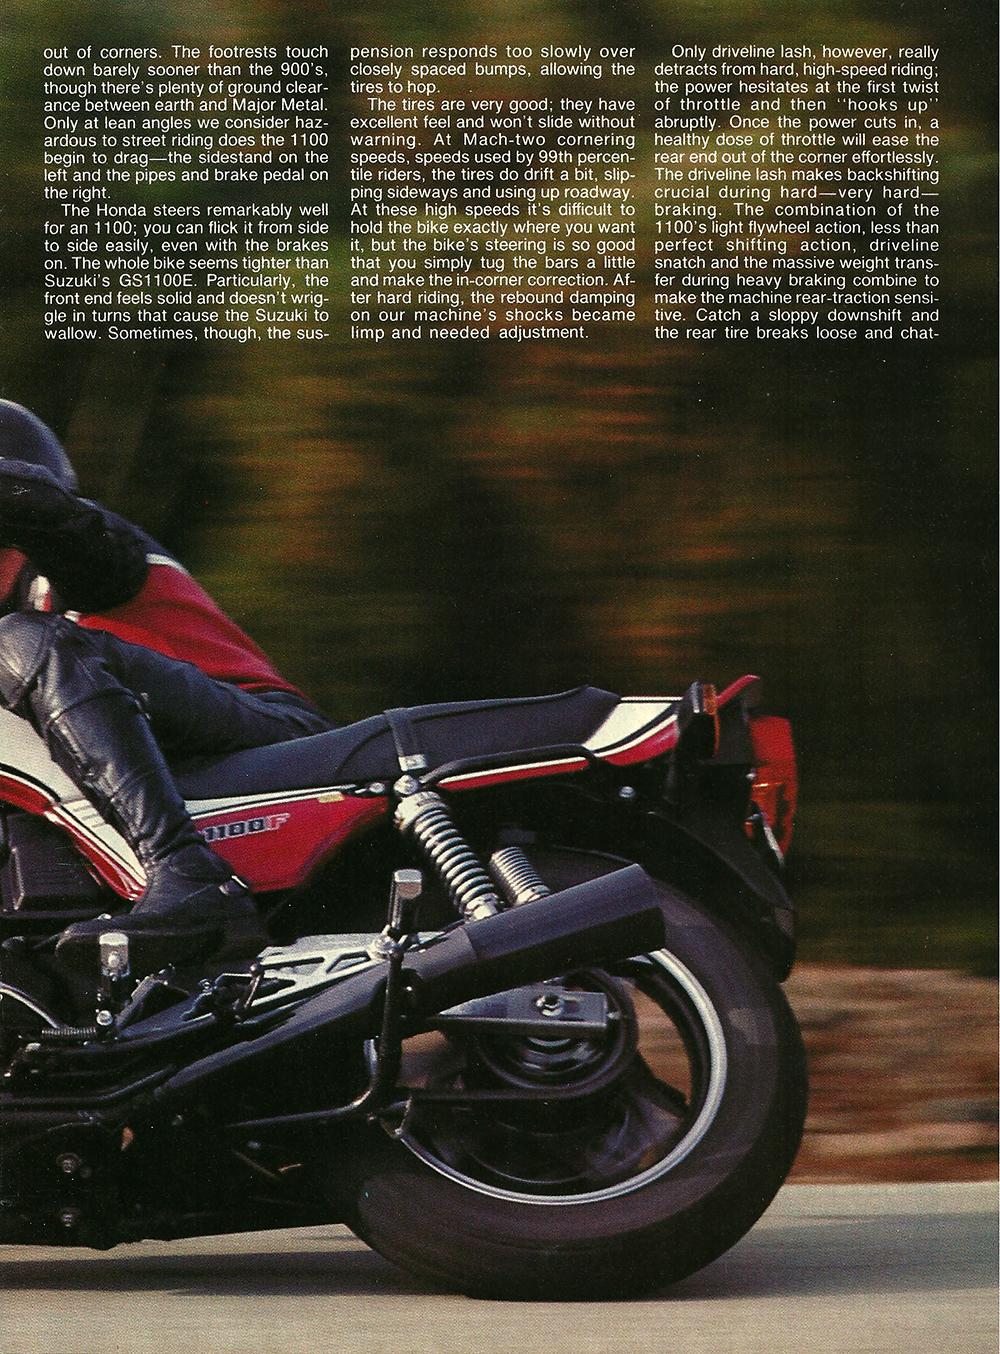 1983 Honda CB1100F road test 4.jpg